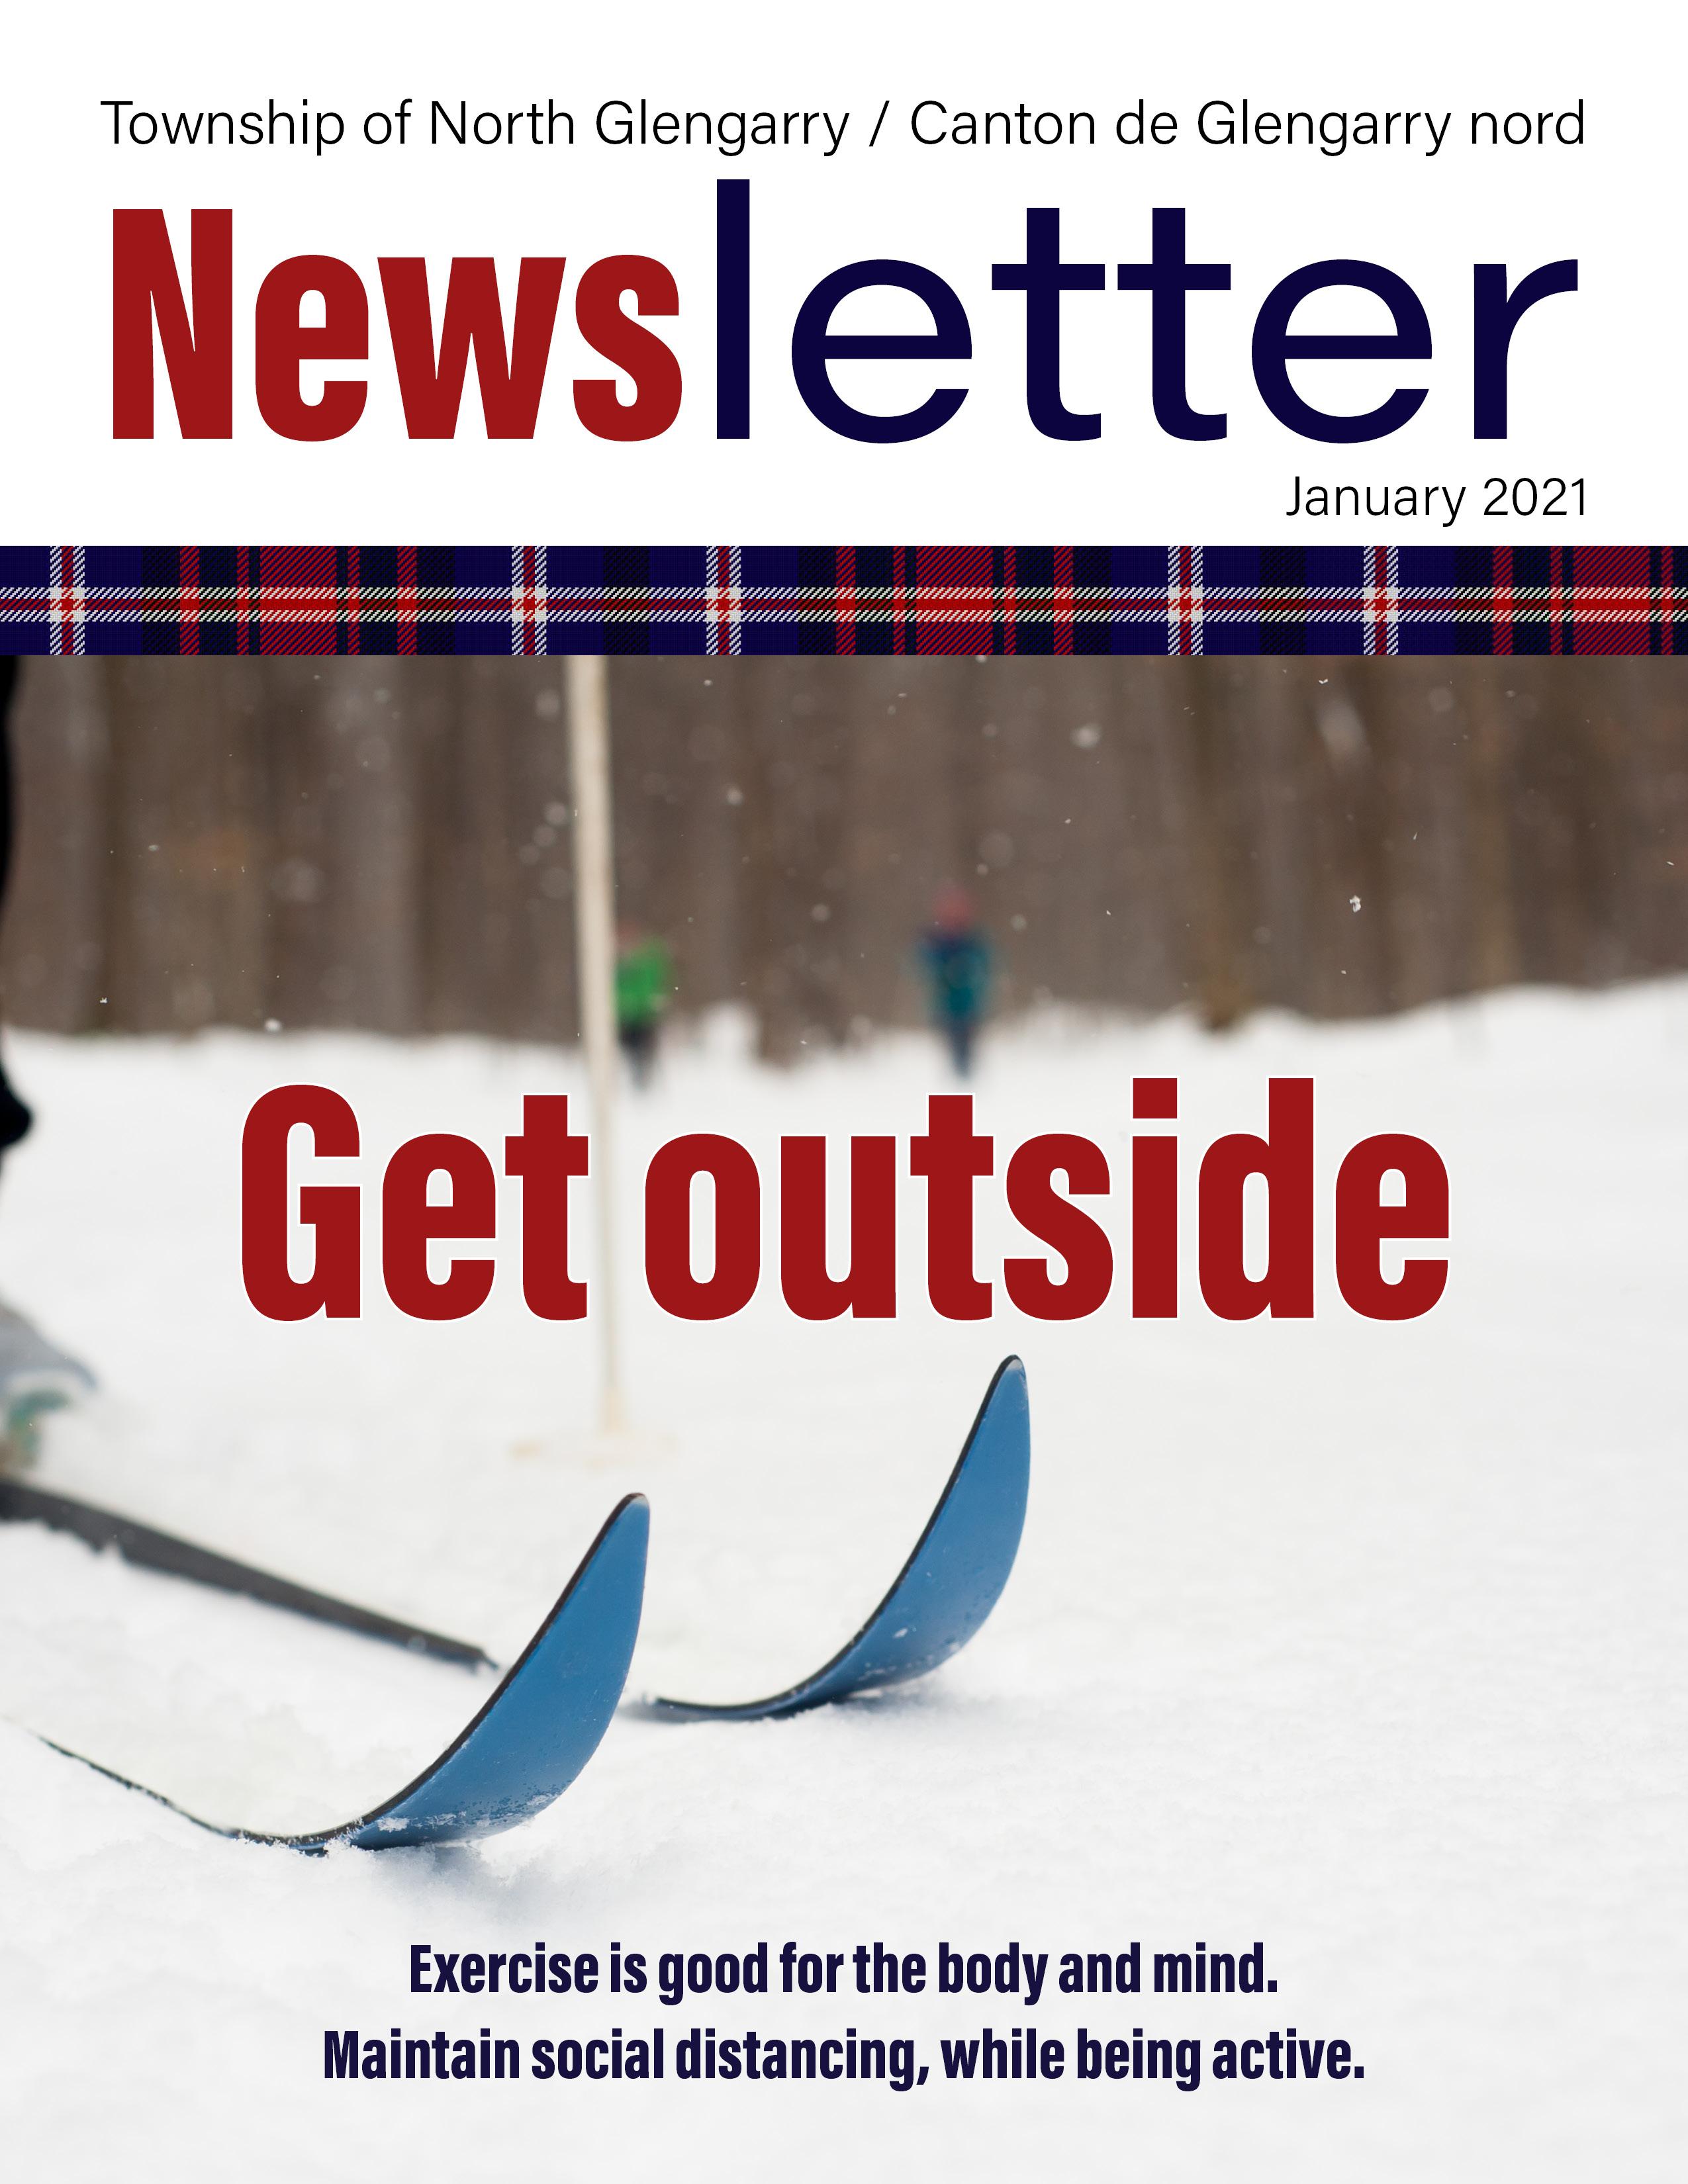 January 2021 North Glengarry Newsletter